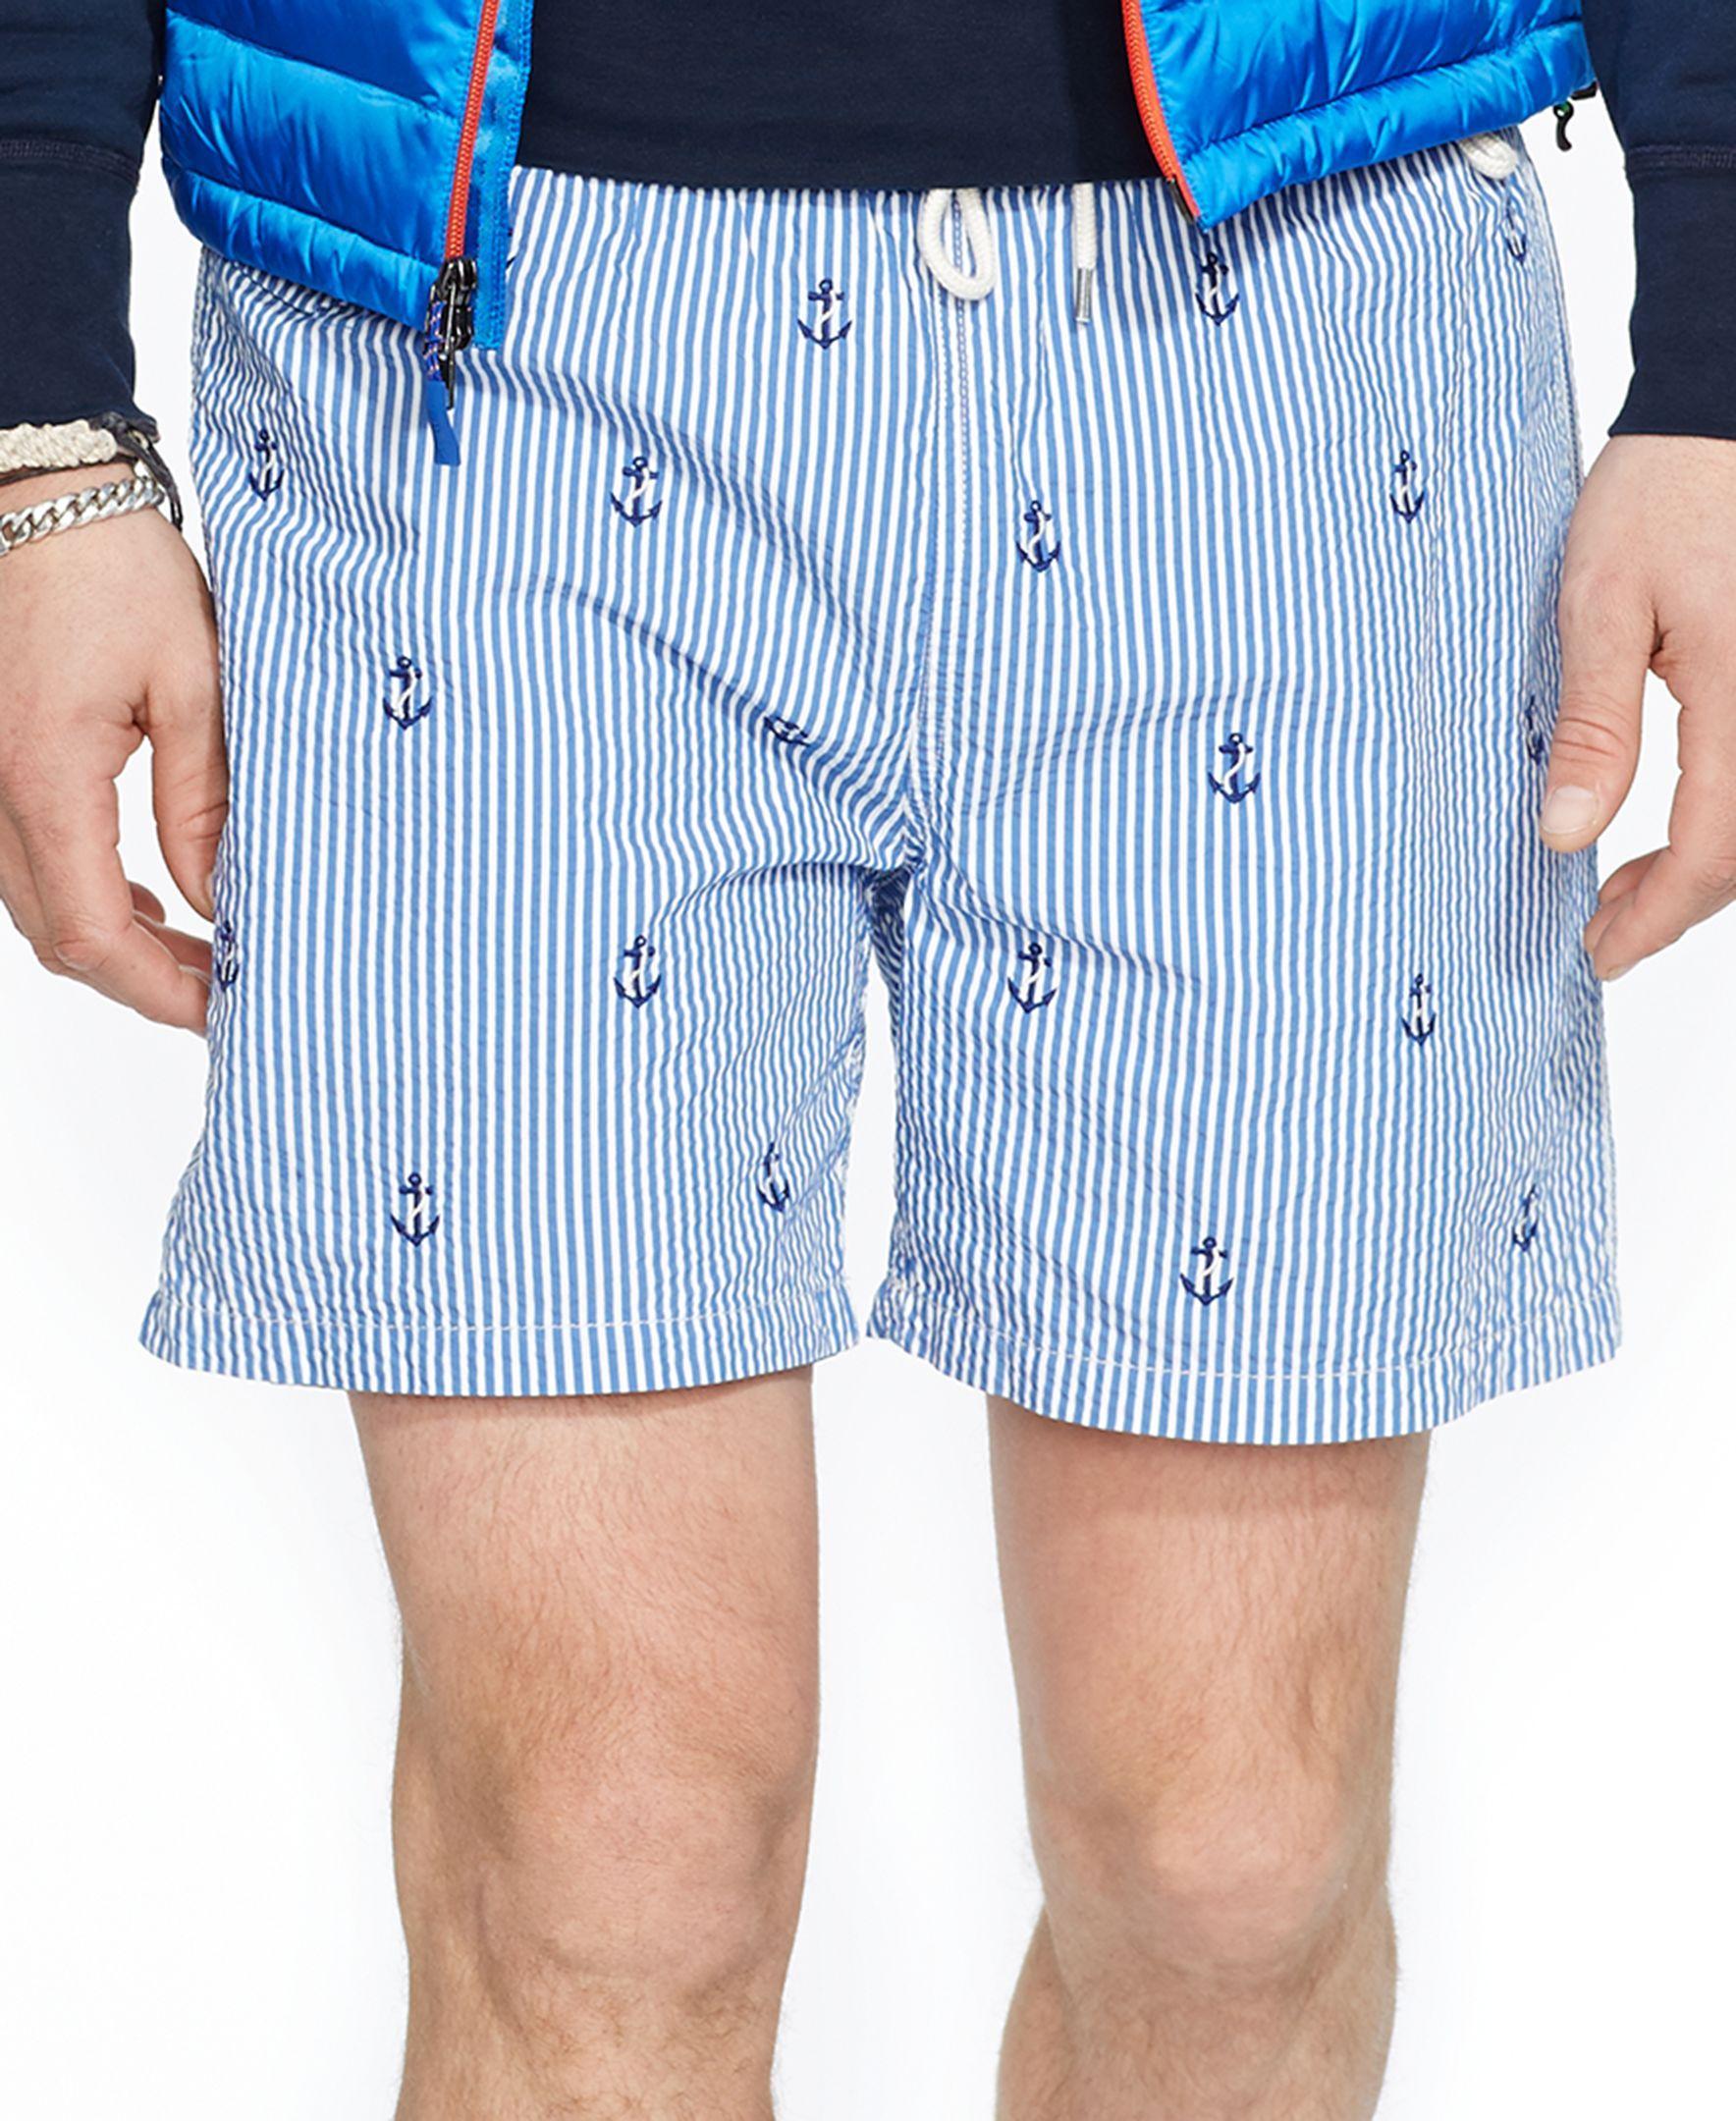 6d7c8189df Polo Ralph Lauren Traveler Anchor-Print Swim Short | Products | Swim ...